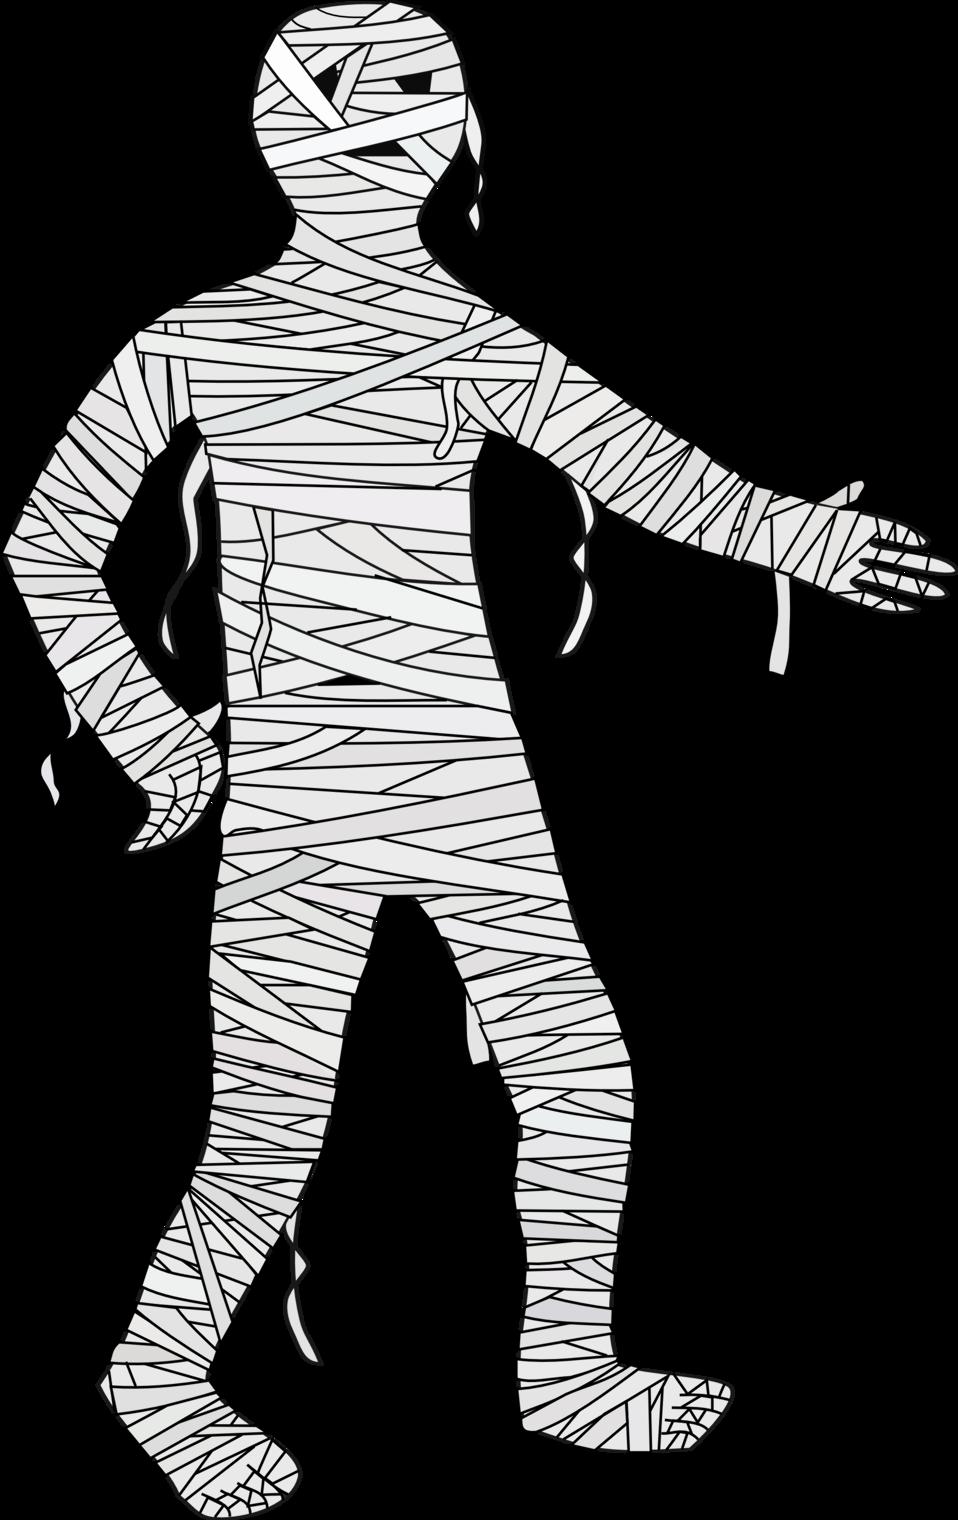 Illustration of a mummy